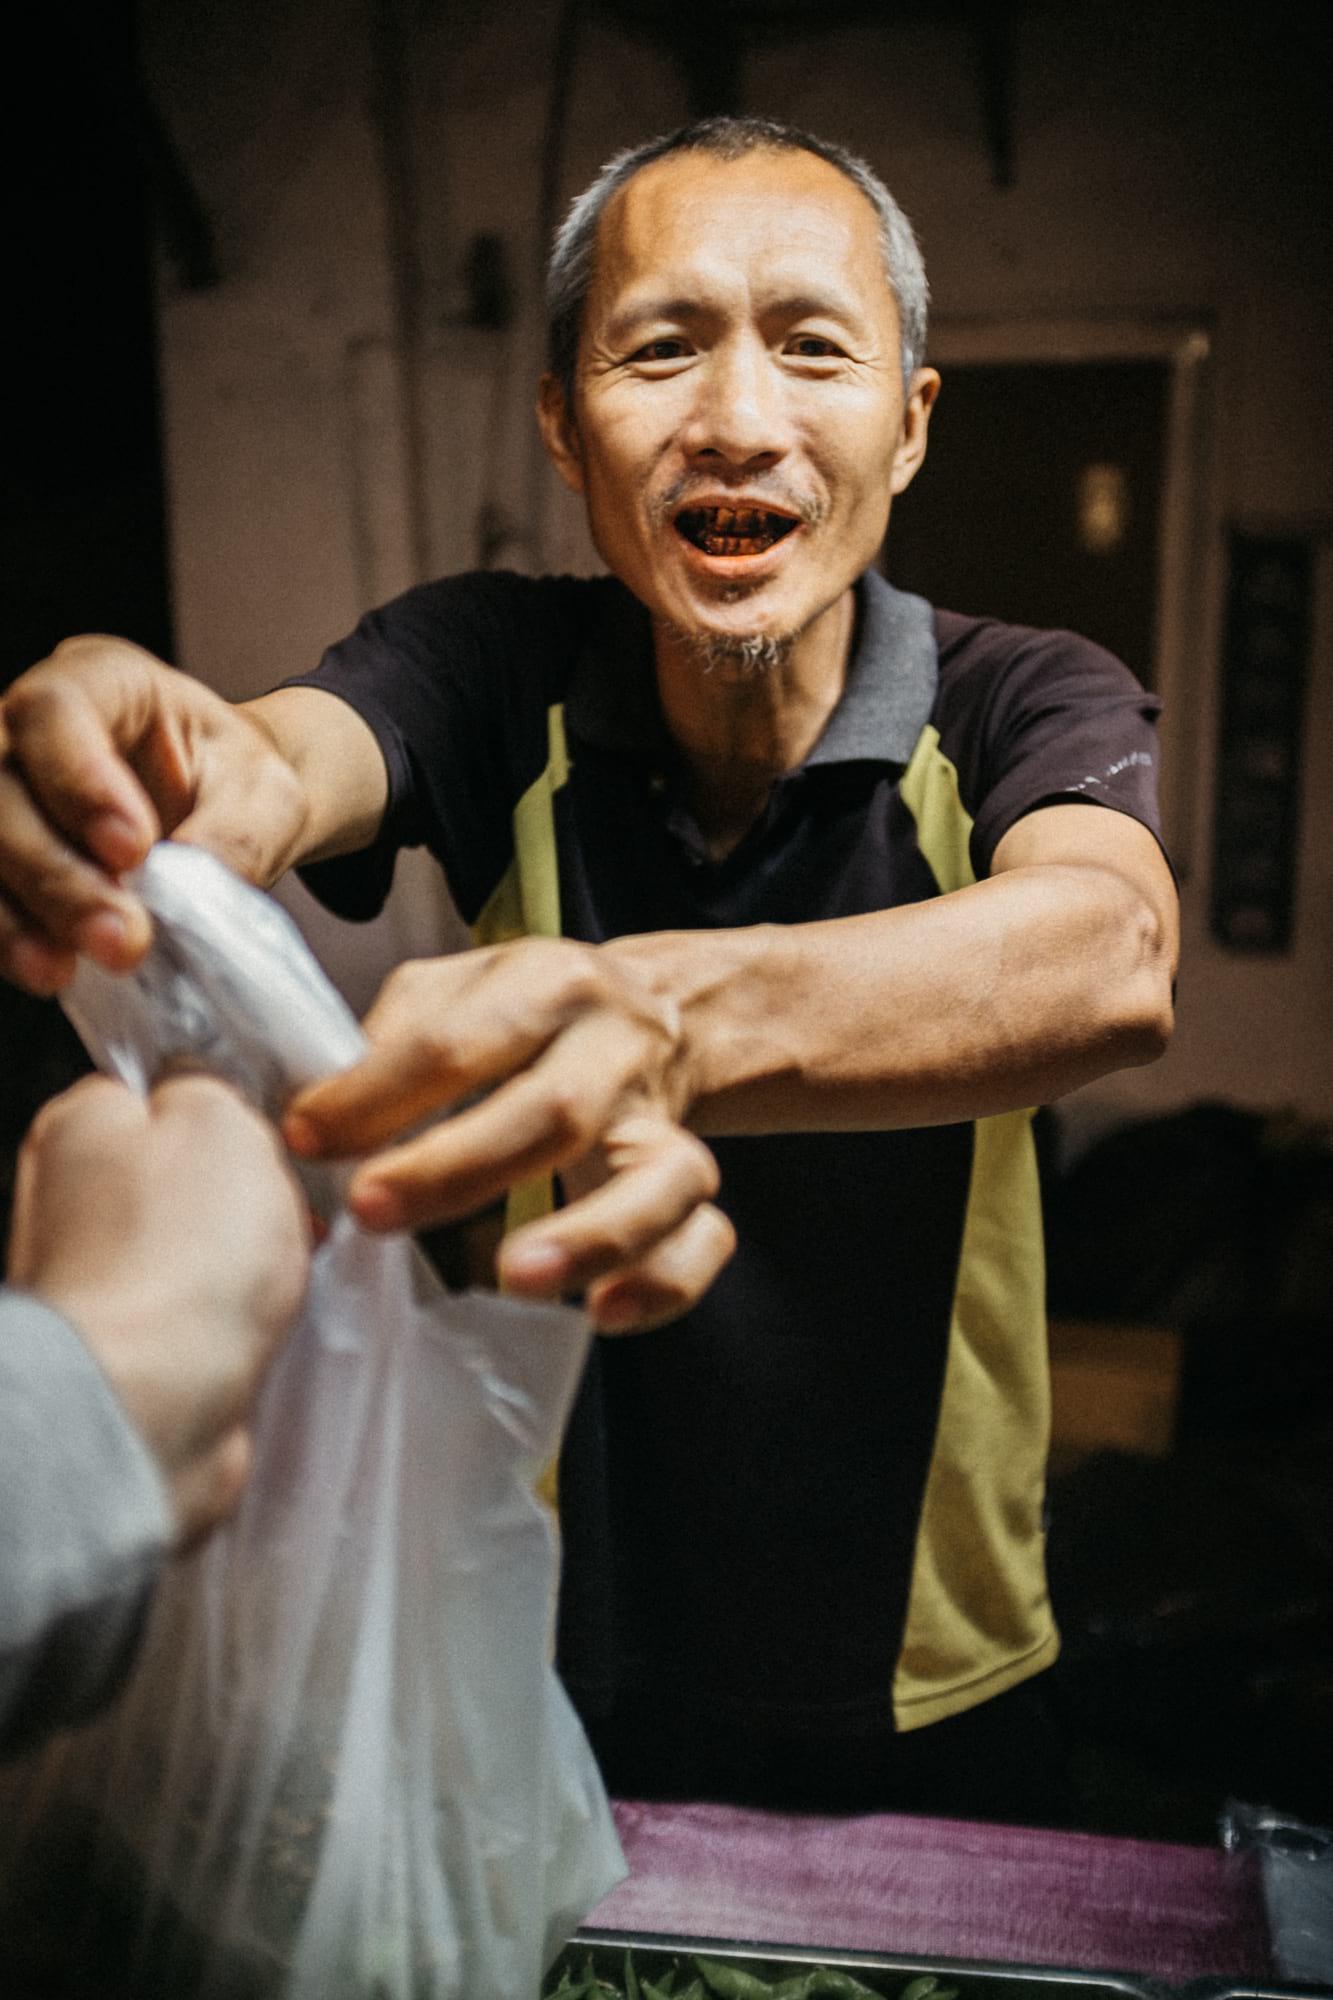 waltsmedia-portrait-taiwan-taipeh-travel-reise-75